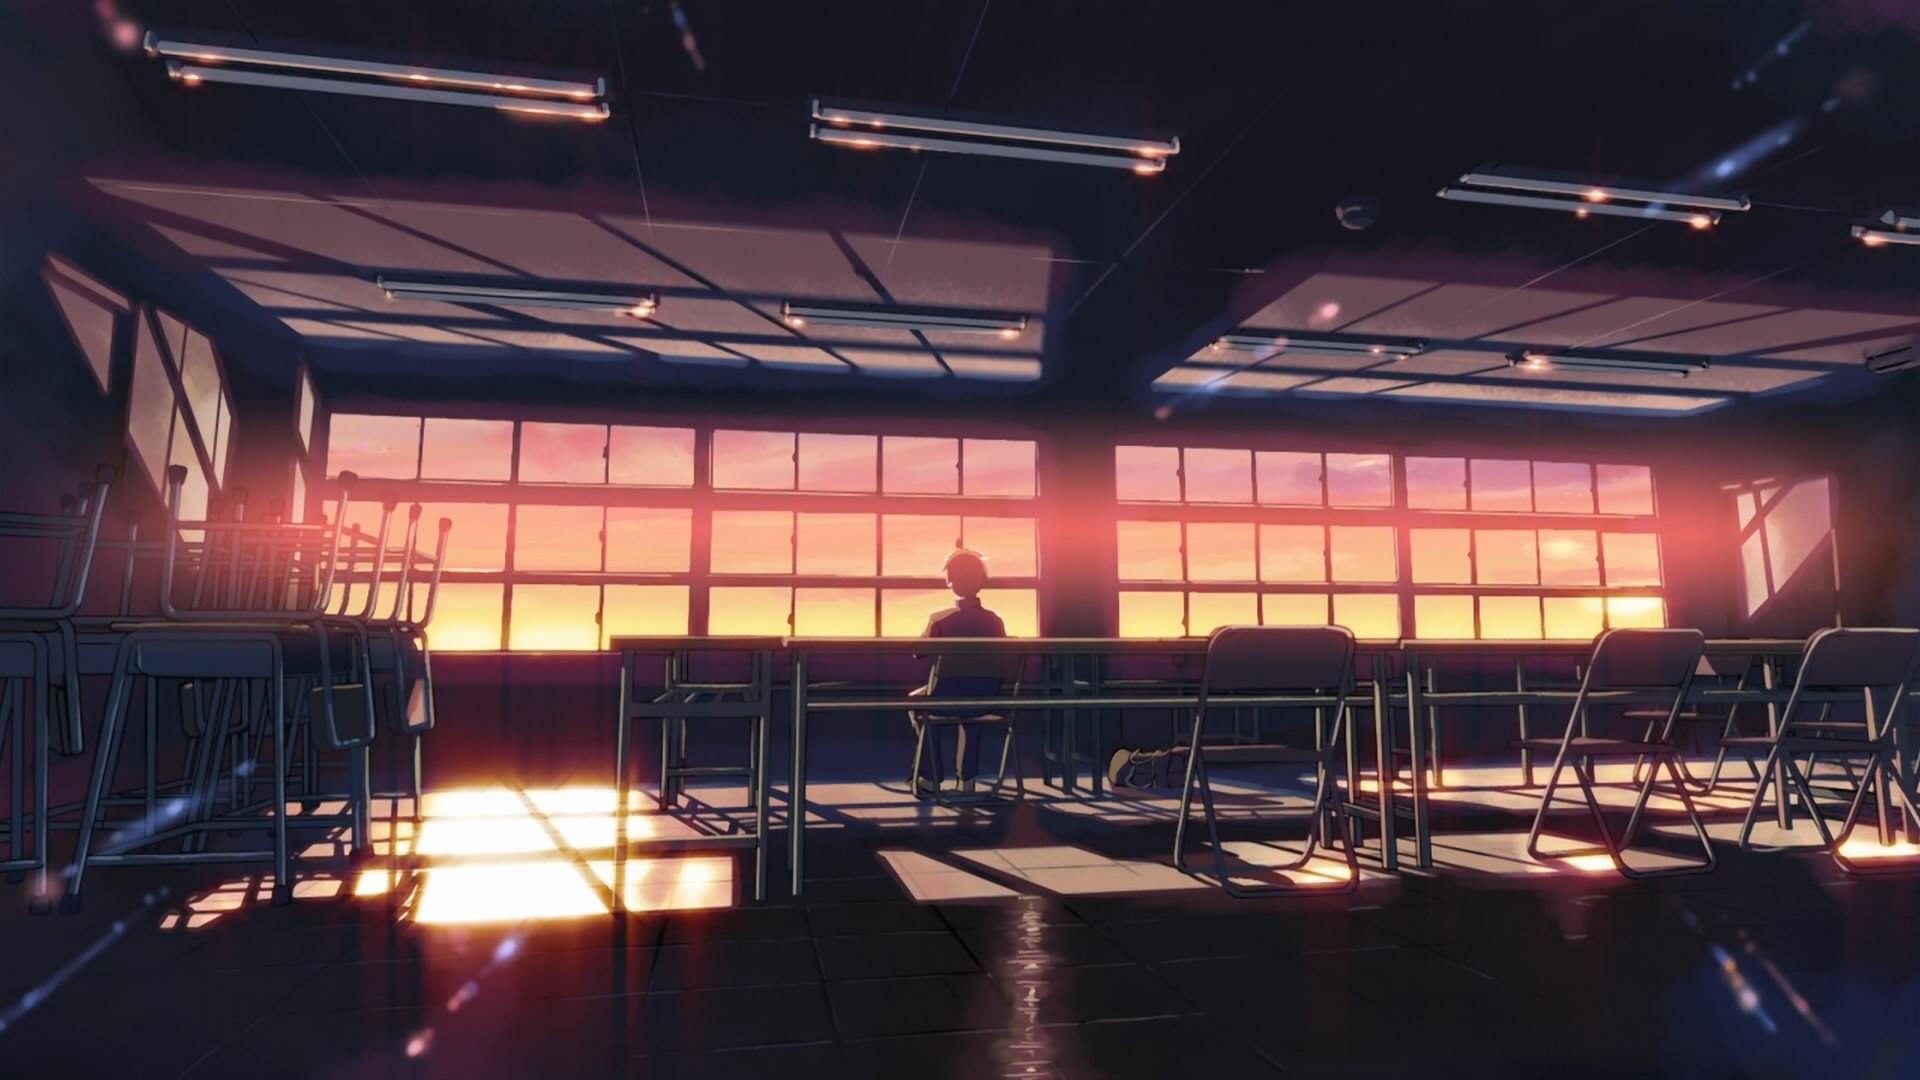 Anime 1920x1080 school classroom anime 5 Centimeters Per Second sunset sunlight desk alone Makoto Shinkai